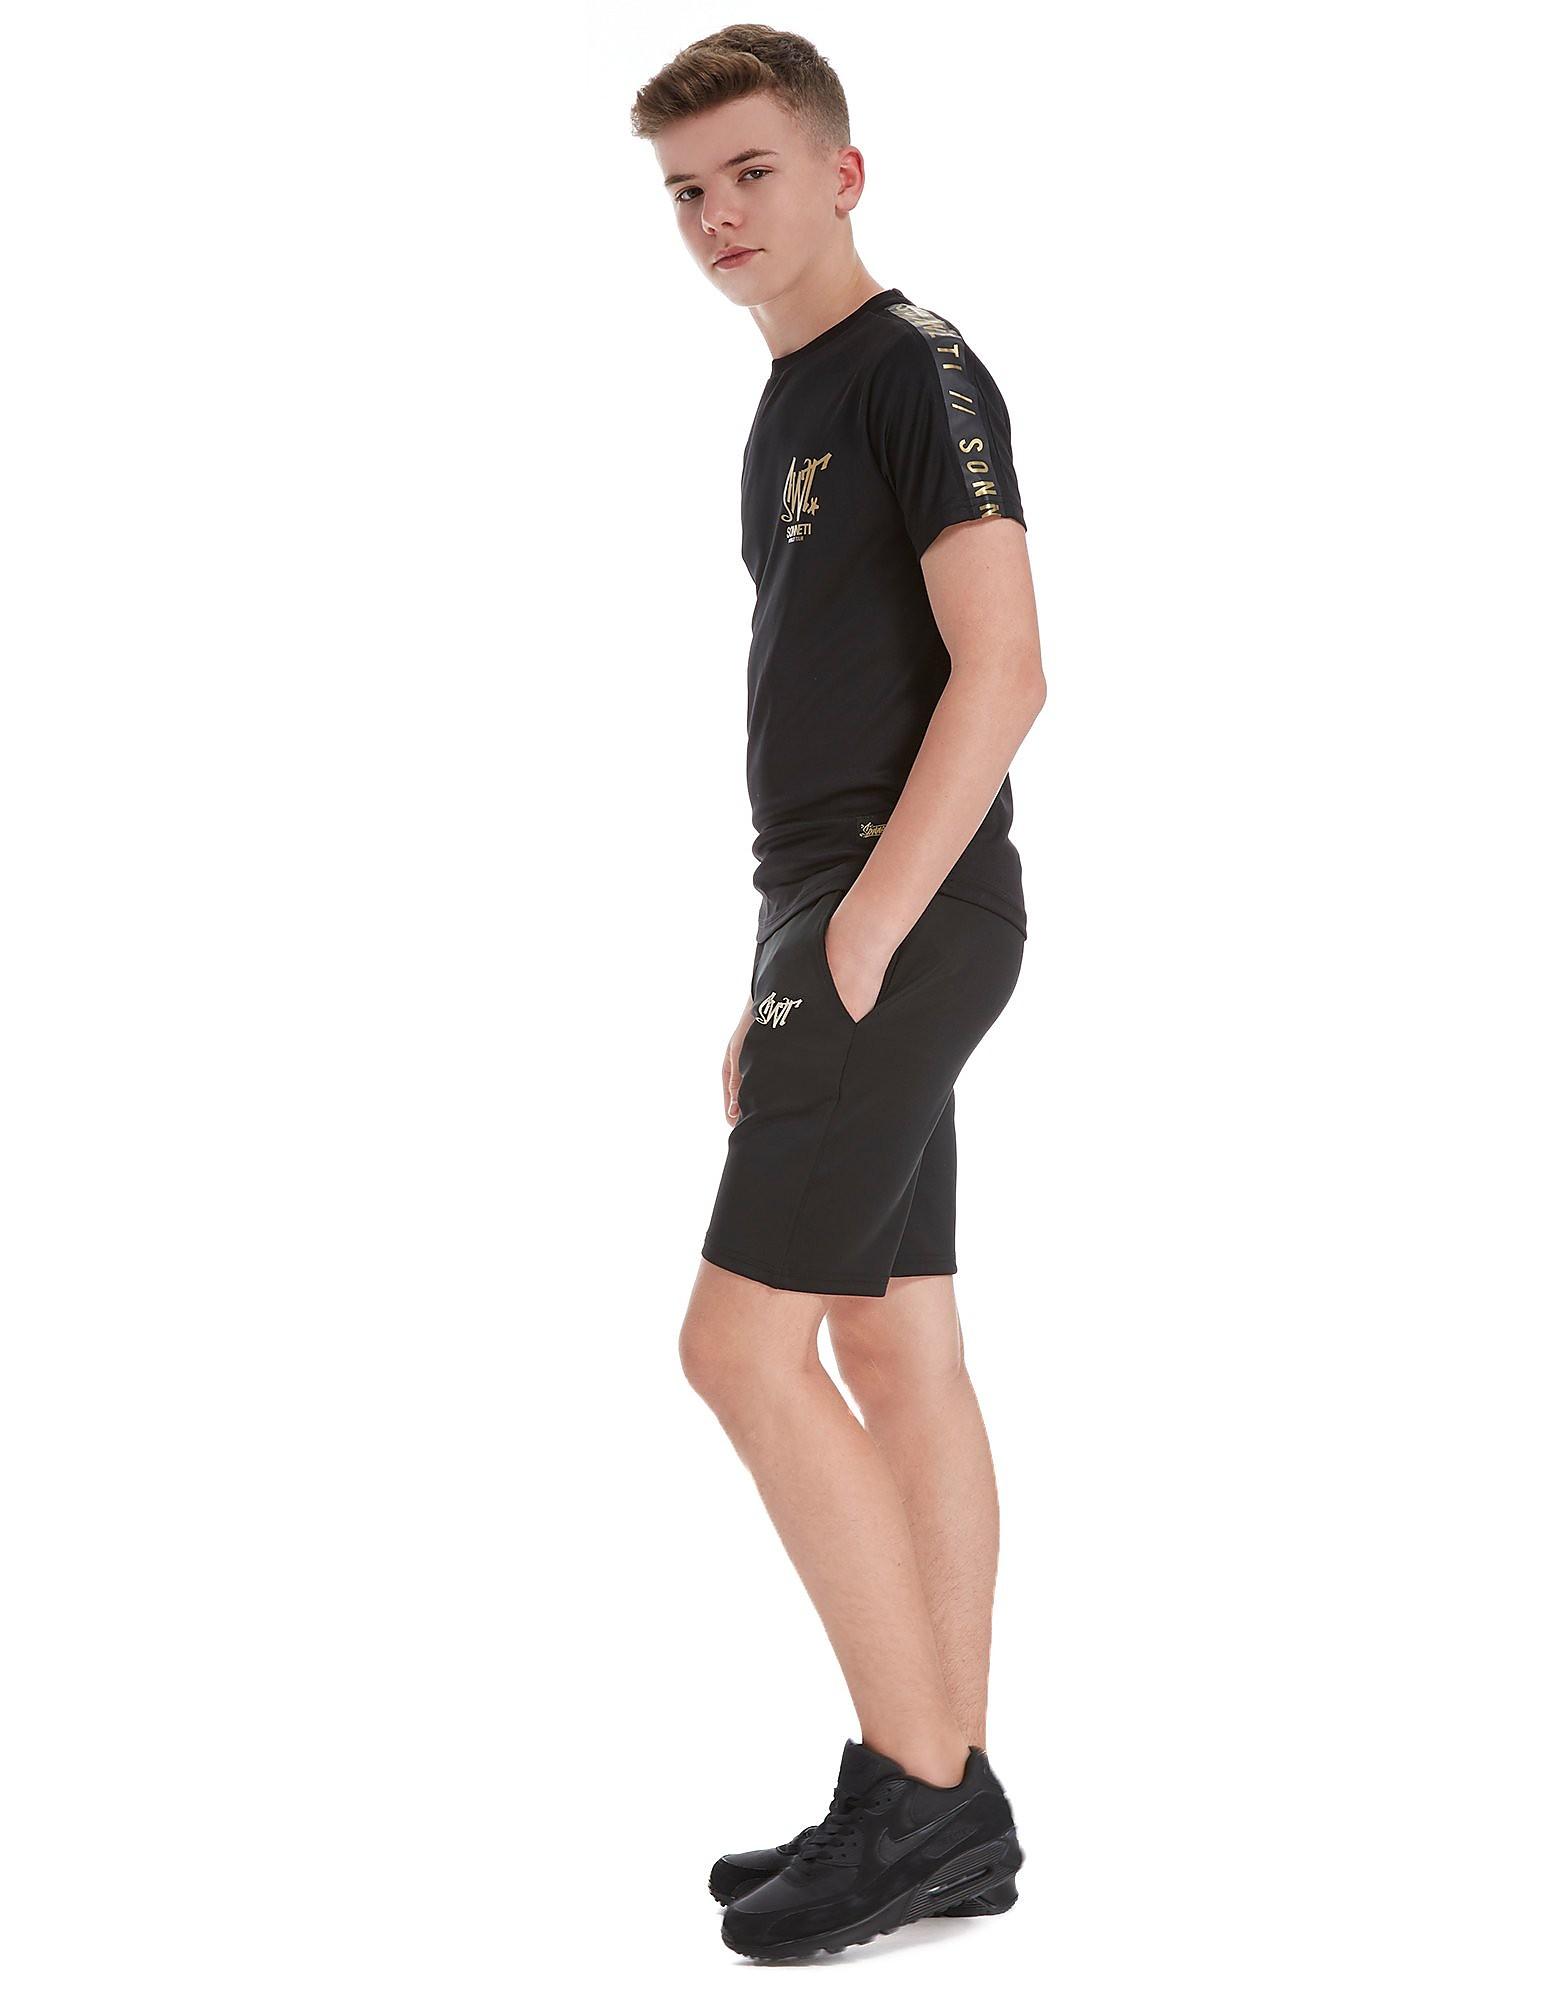 Sonneti Tastic Shorts Junior - Zwart - Kind